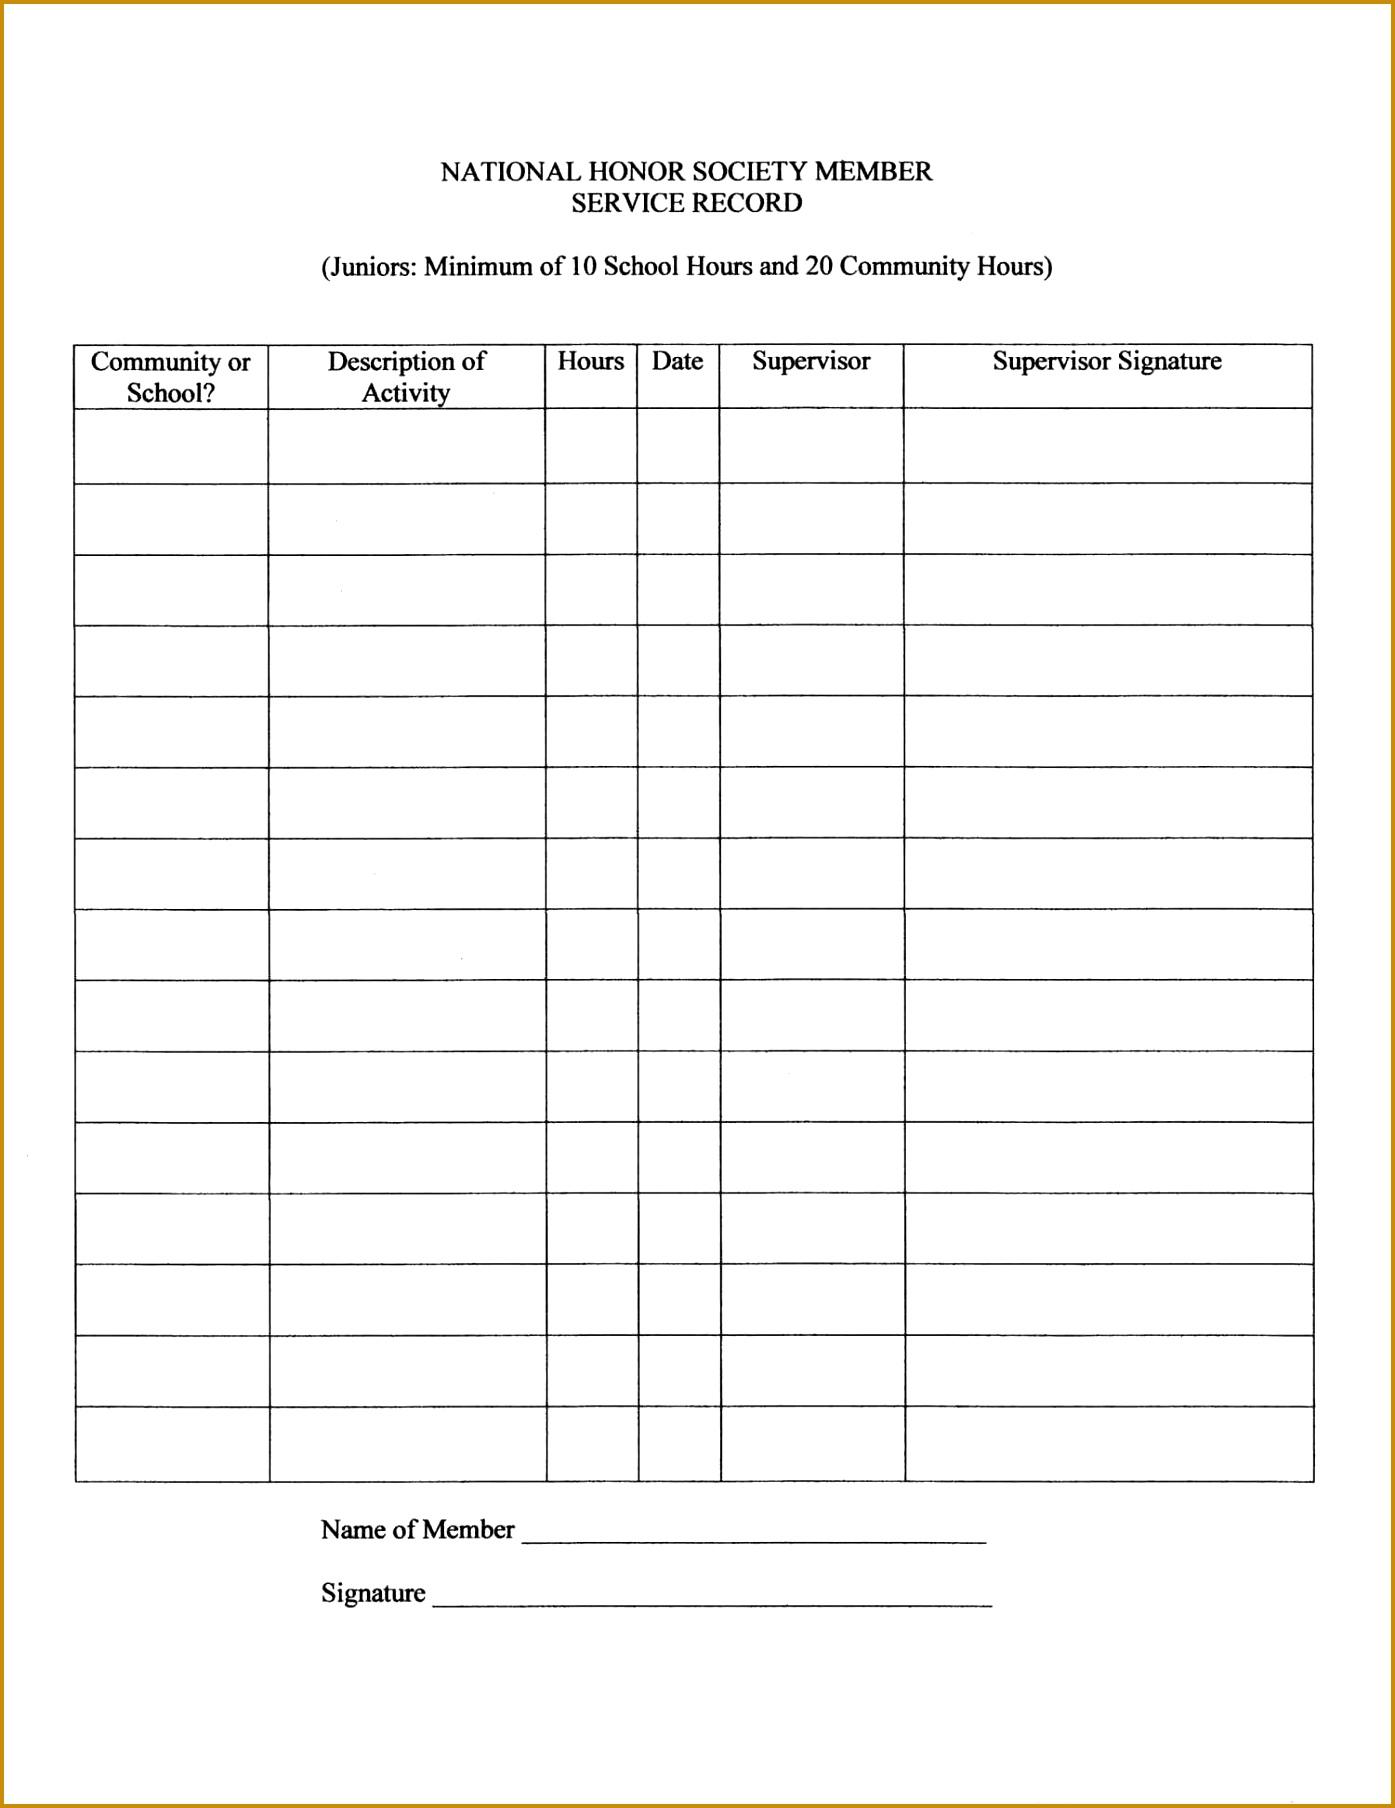 What Hours Maintenance Log Sheet Log Sheet Printable munity Chart Volunteer Template What Maintenance Memo Templates 18081395